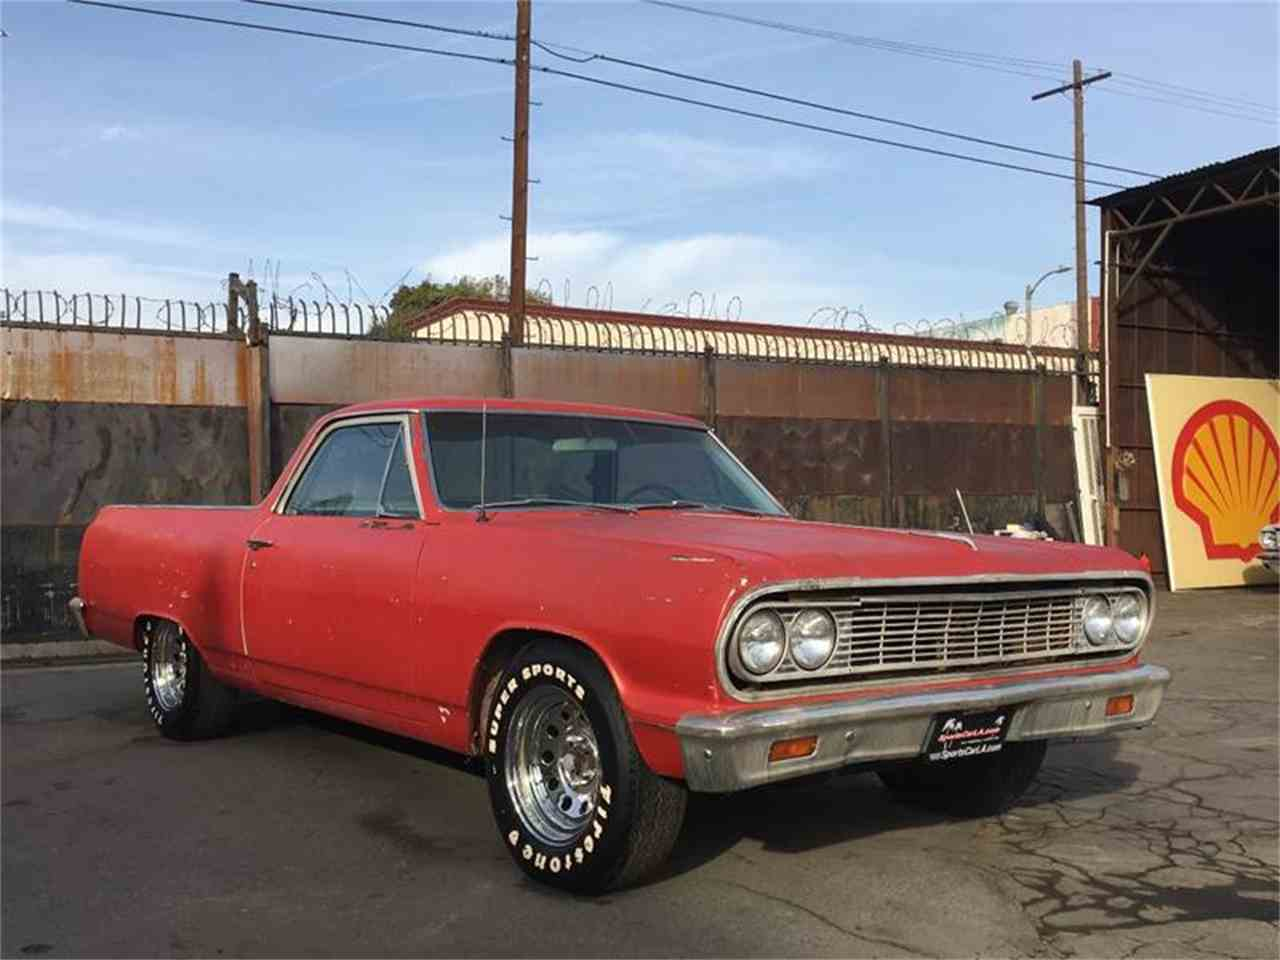 1964 Chevrolet El Camino for Sale | ClassicCars.com | CC-1058618